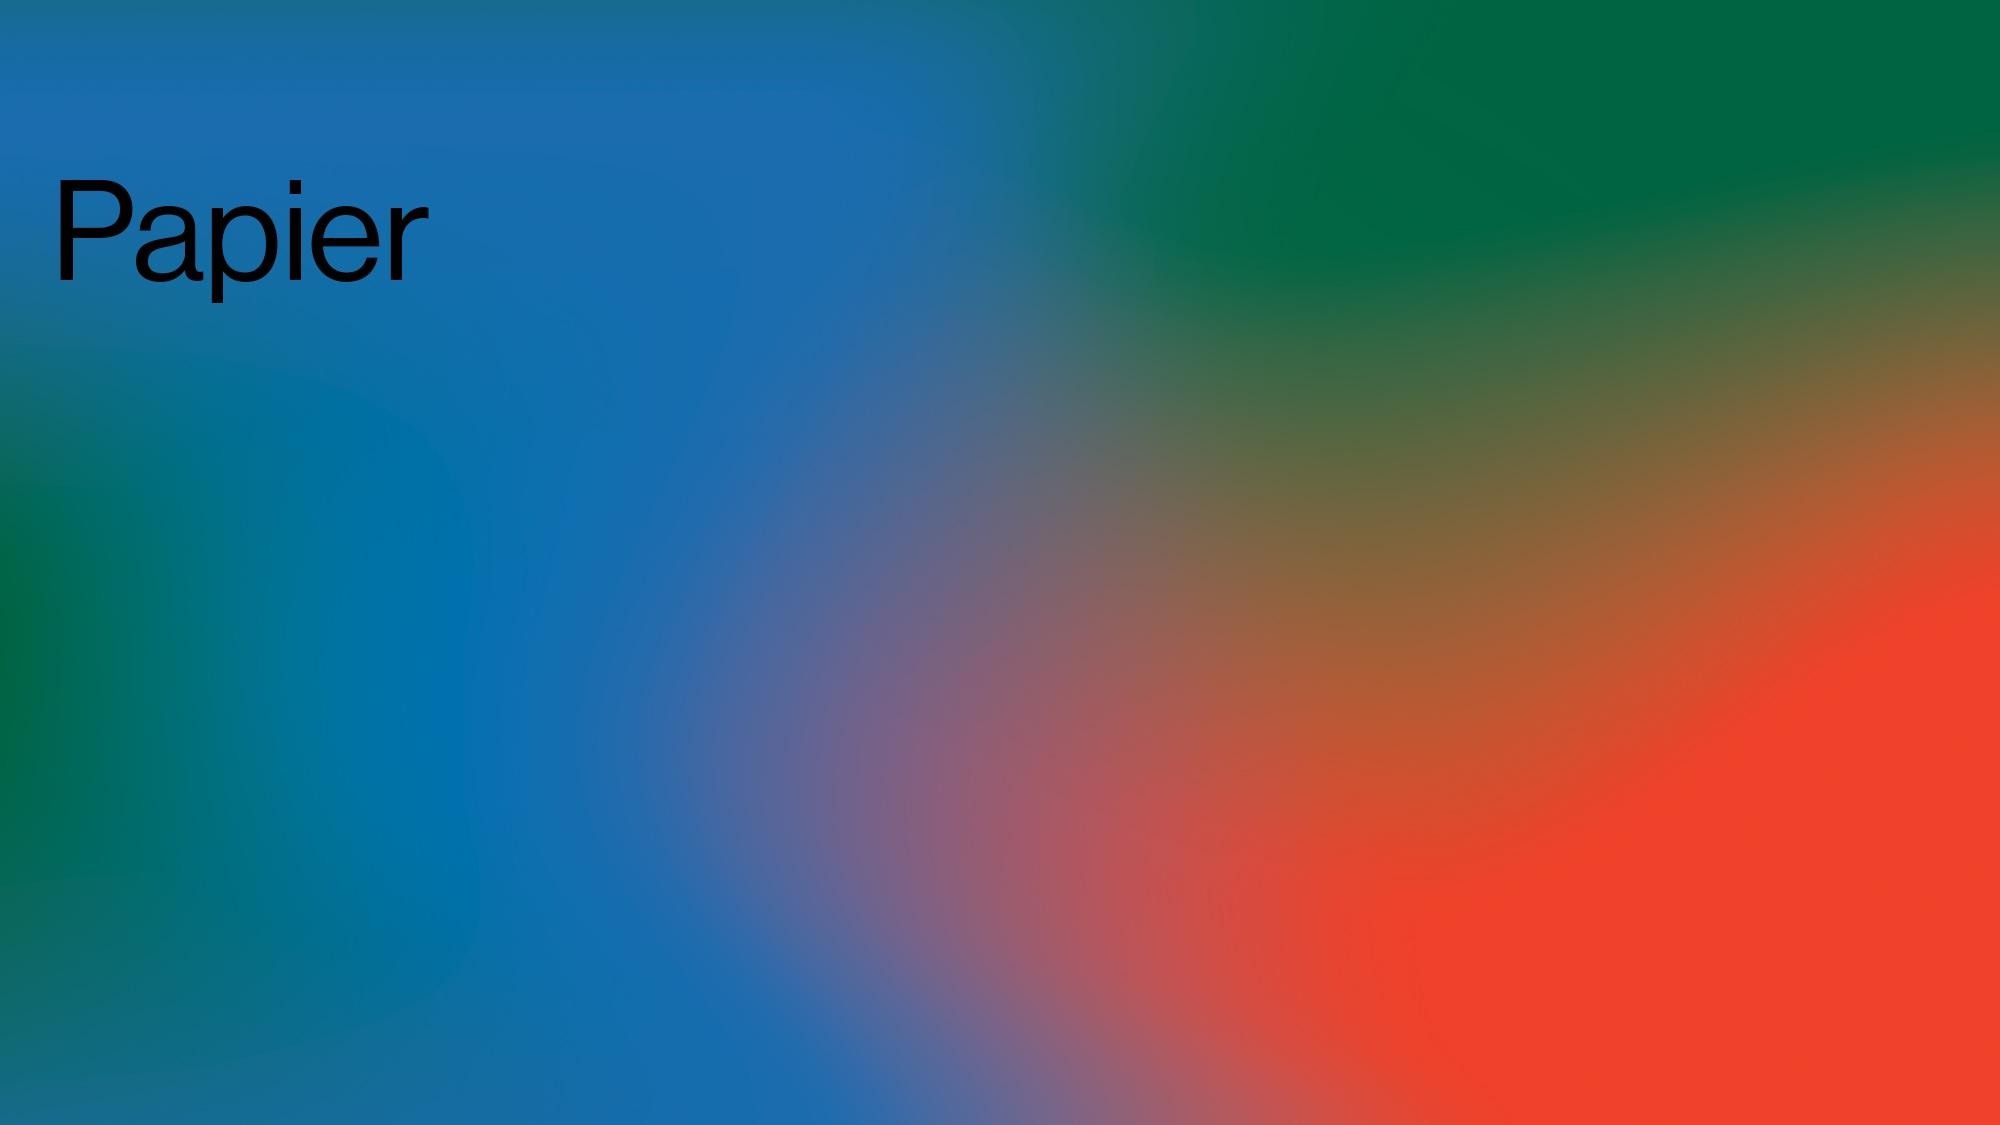 Papier_Squarespace_.jpg